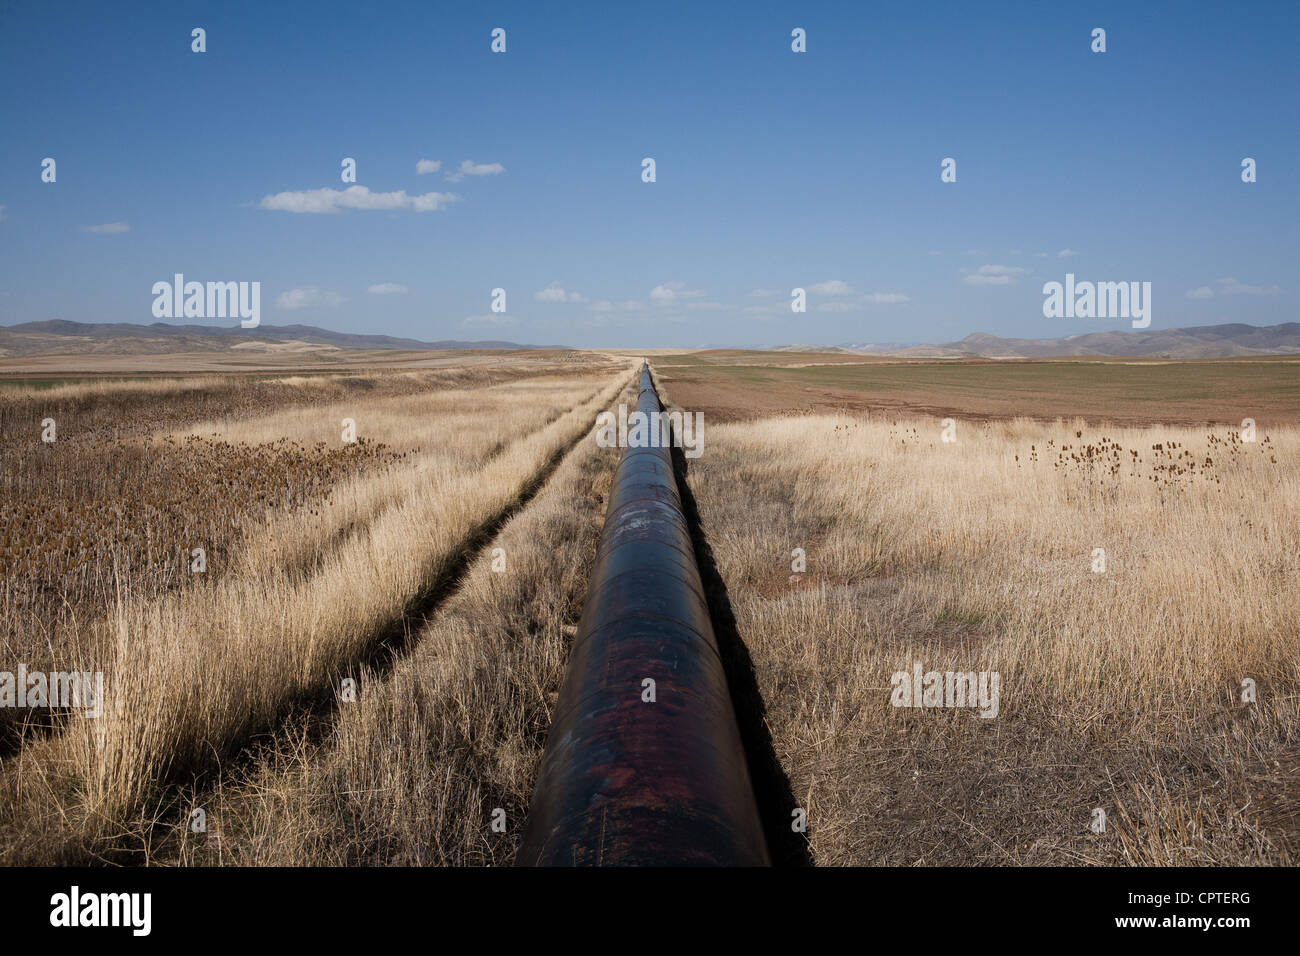 Gas pipeline in field, Idaho, USA - Stock Image